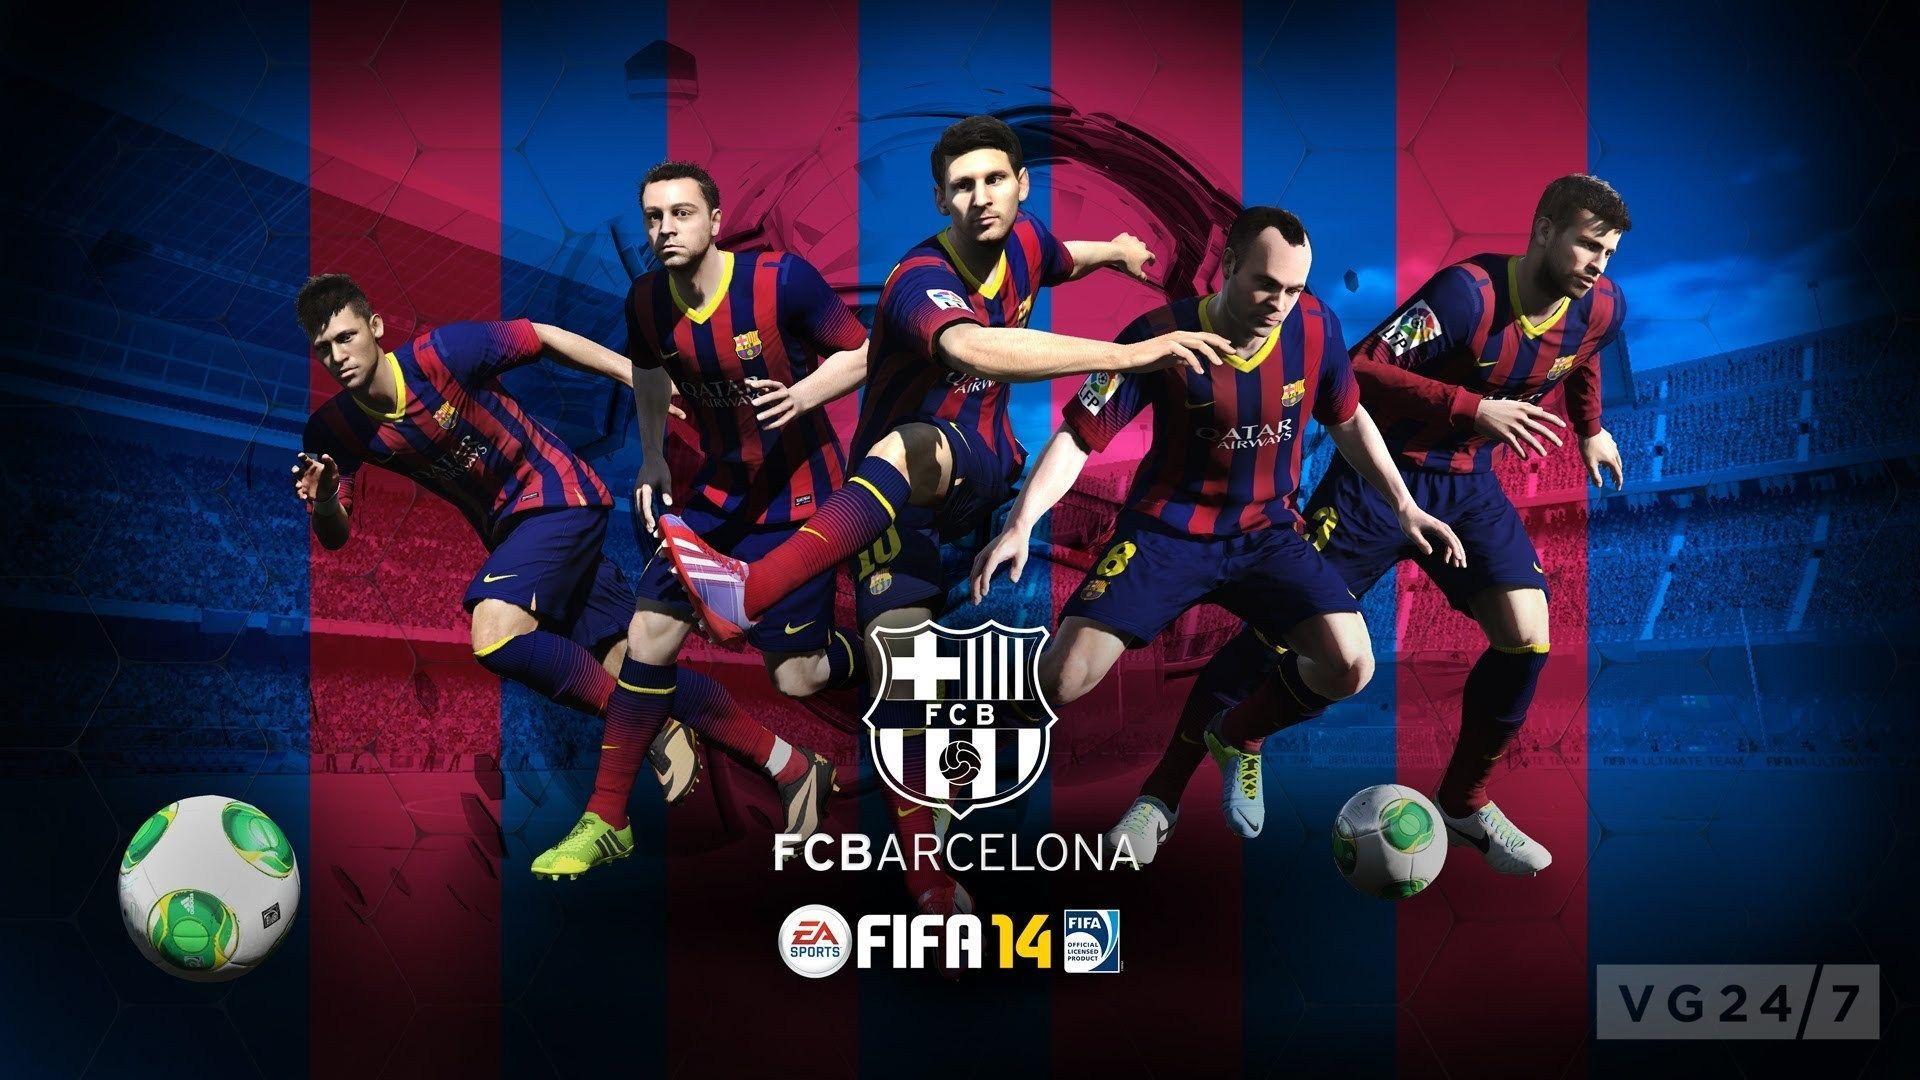 IPhone FC Barcelona Wallpaper CTG LigraficaMX Nike 1920x1080